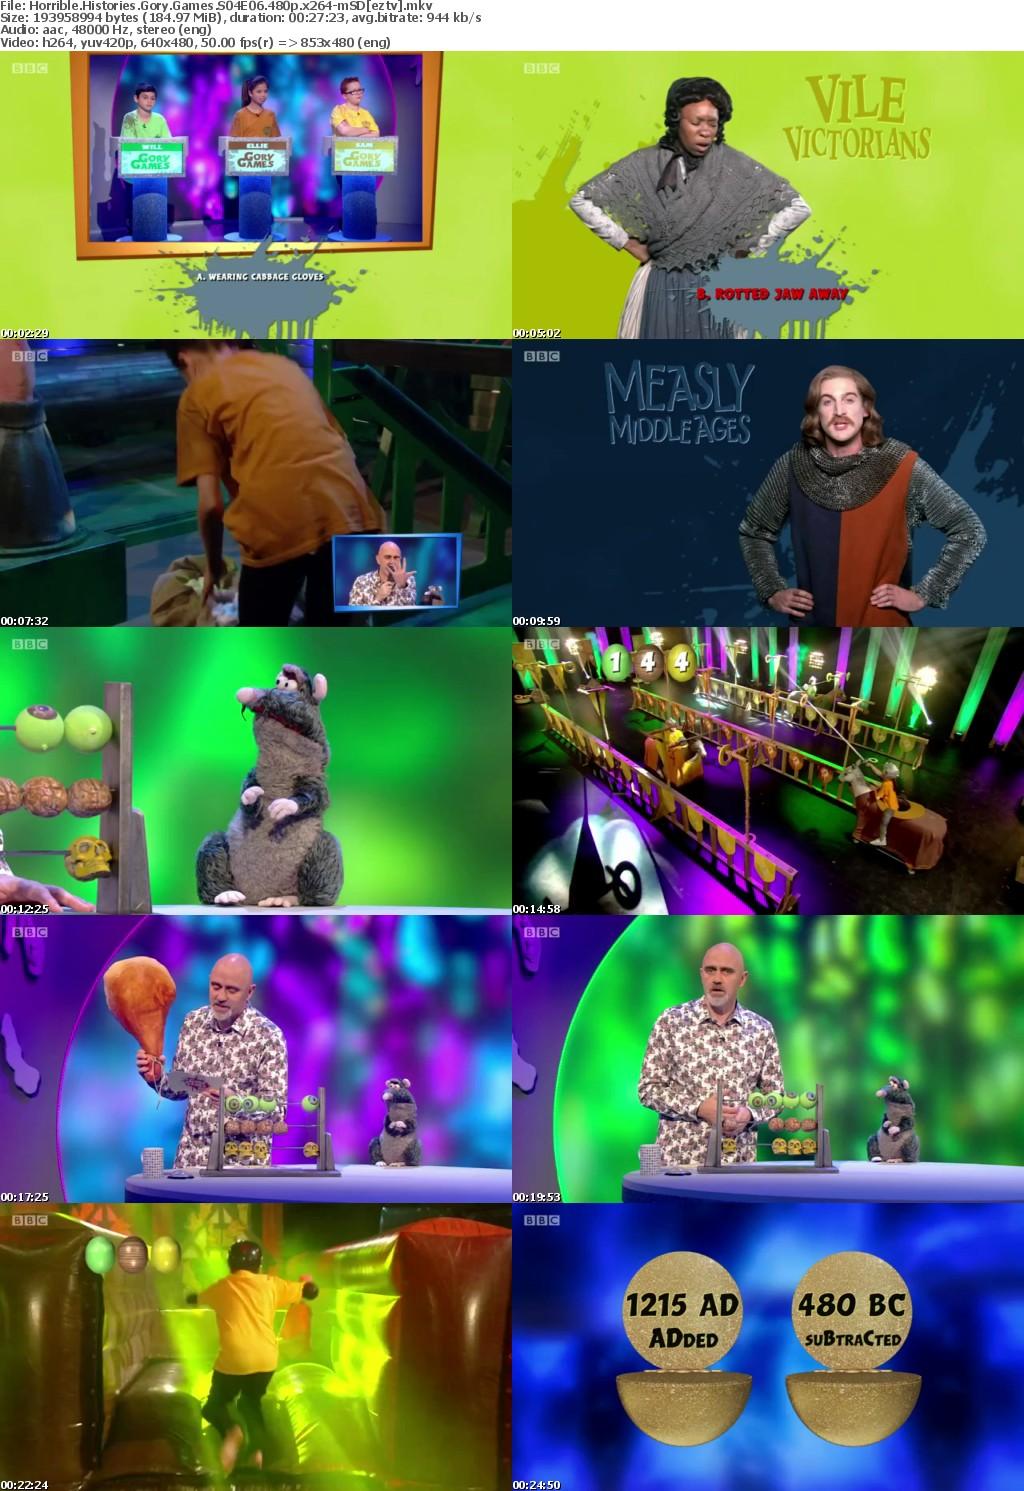 Horrible Histories Gory Games S04E06 480p x264-mSD